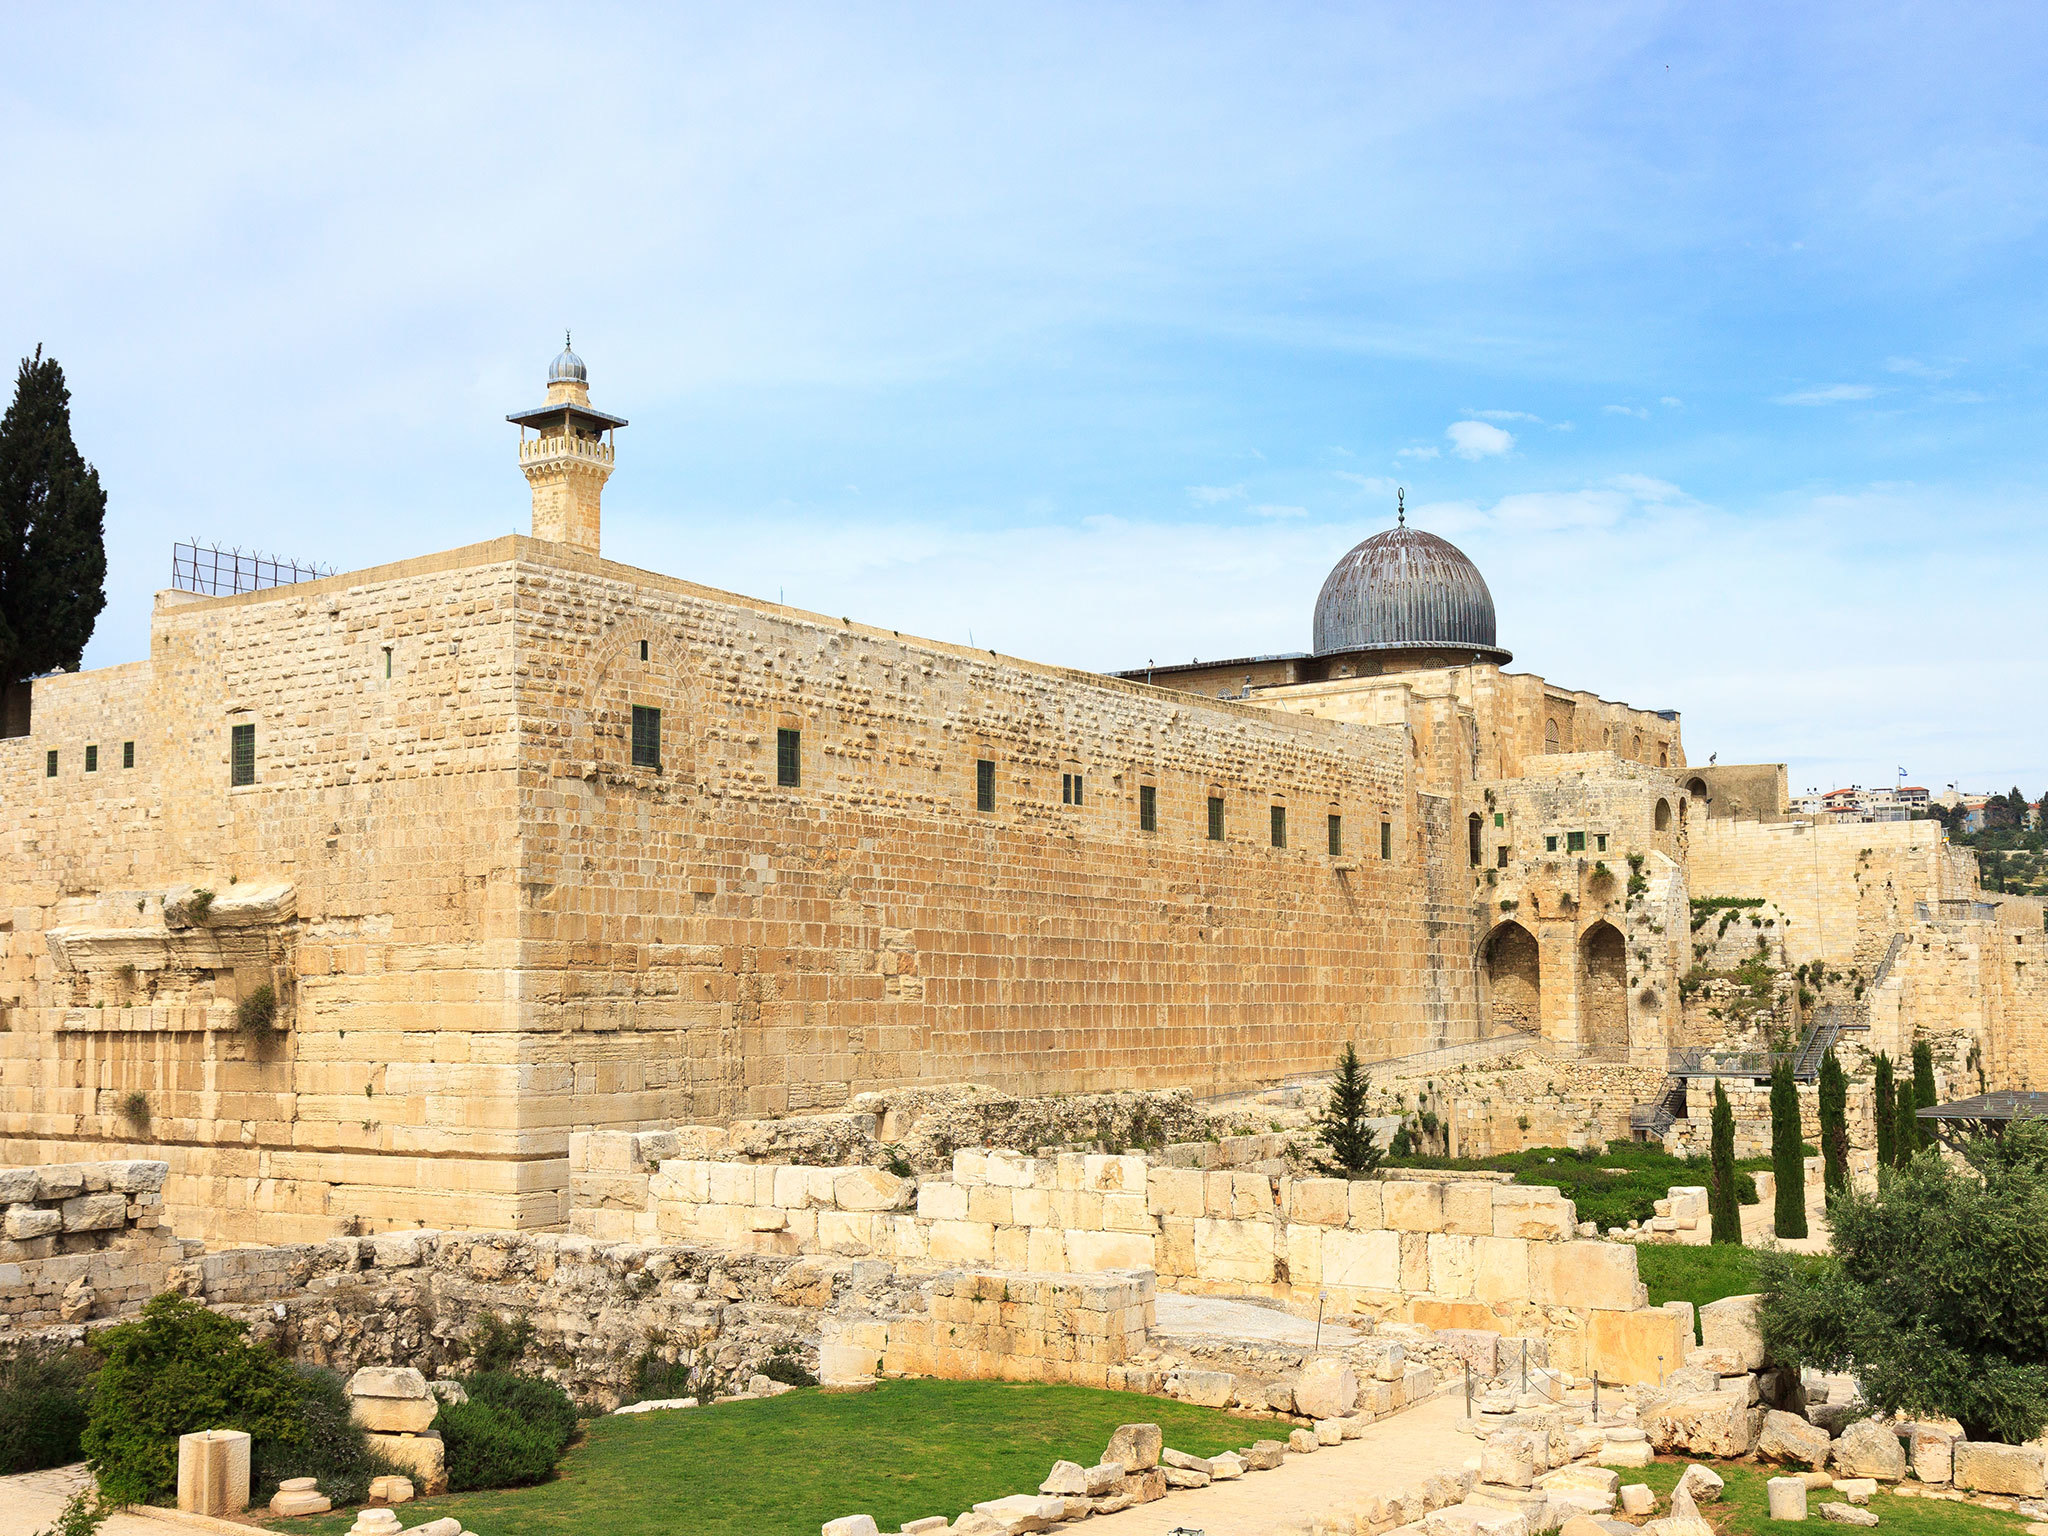 Jewish history Israel – visit famous landmarks like Yad Vashem